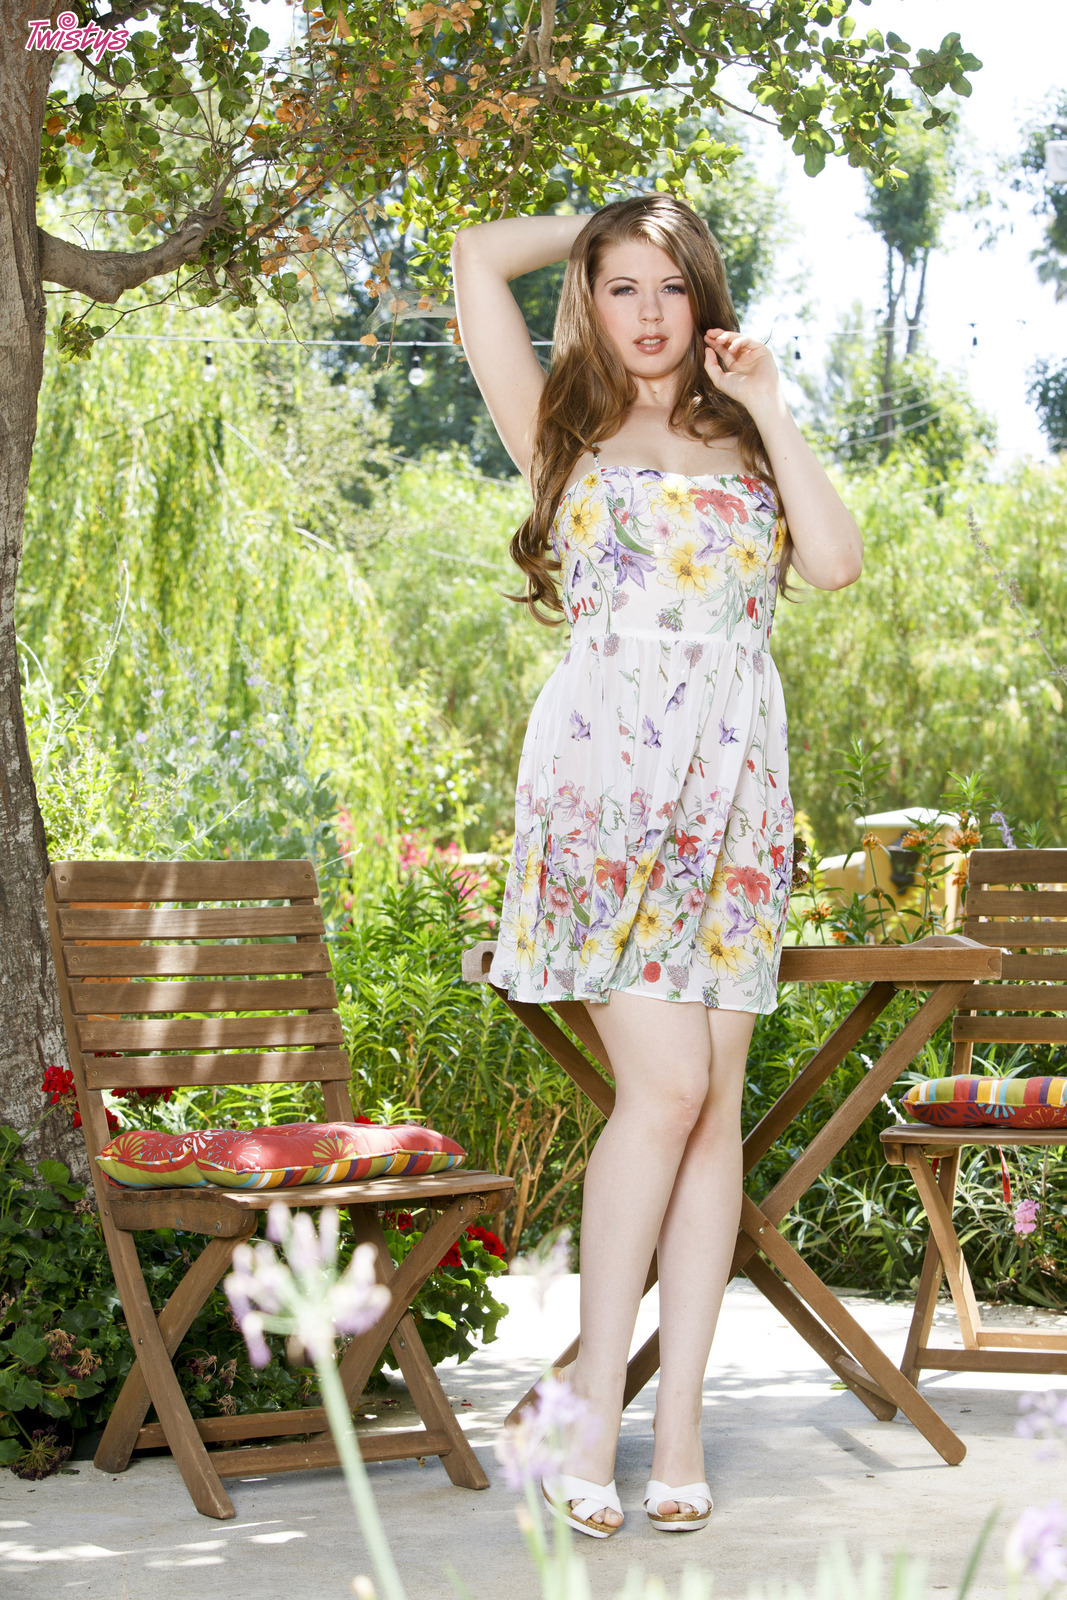 Jessi Junes Pictures. Hotness Rating = 9.21/10